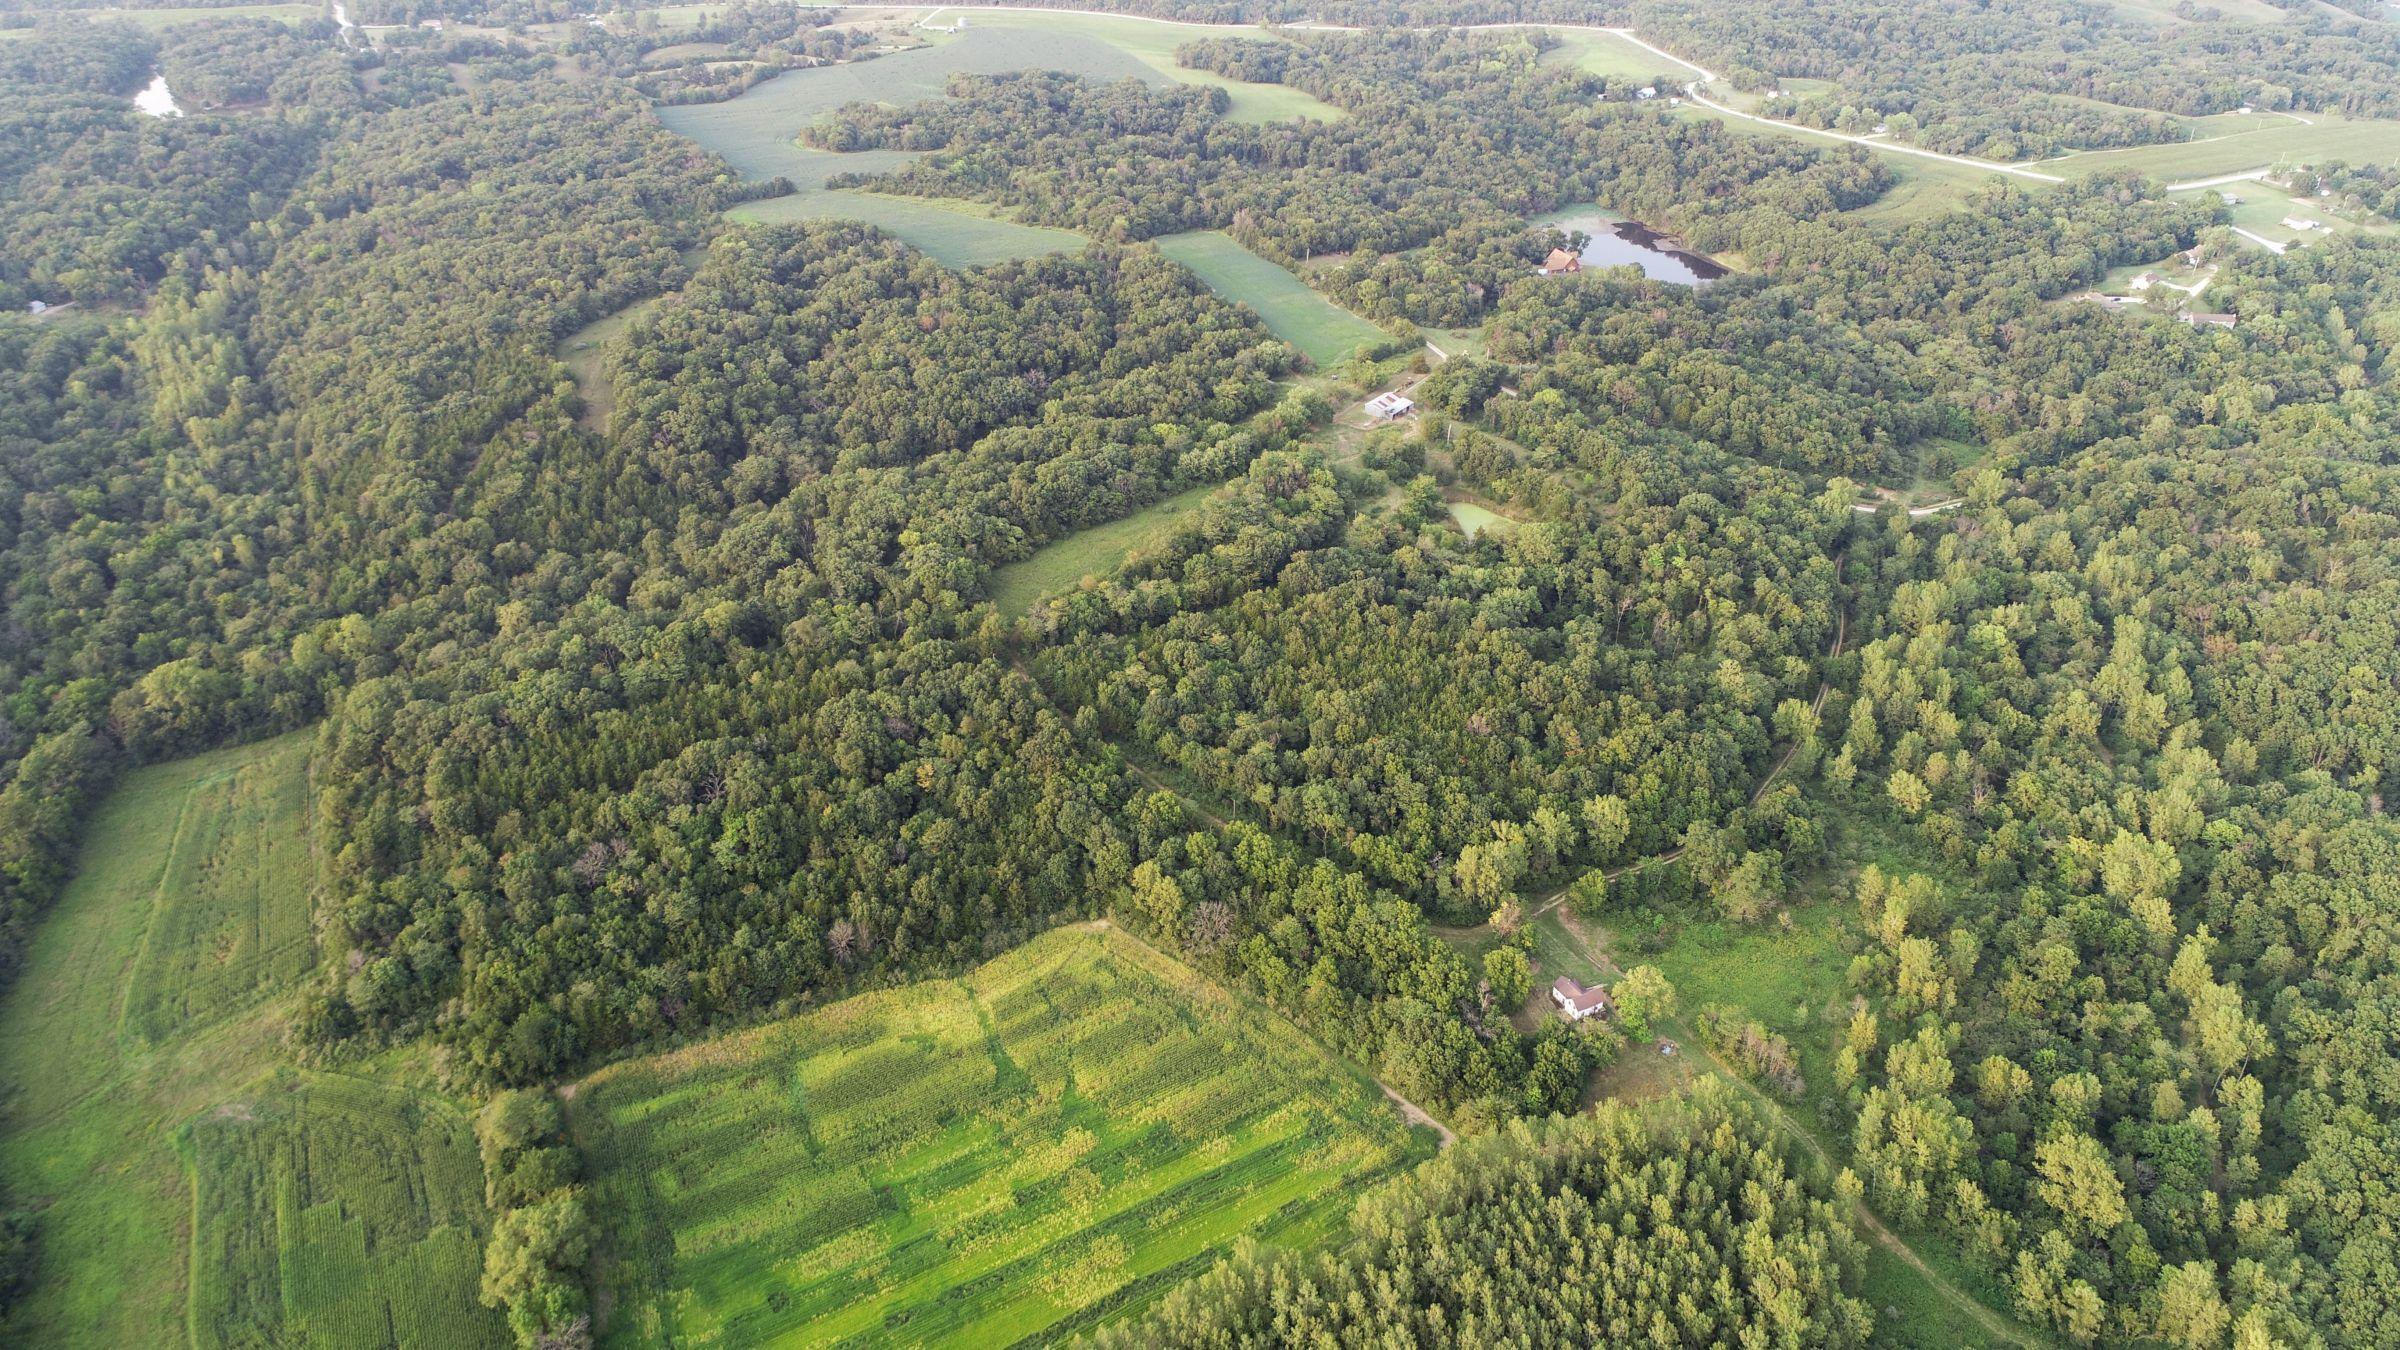 land-lee-county-iowa-328-acres-listing-number-15137-11-2020-08-27-175043.jpg